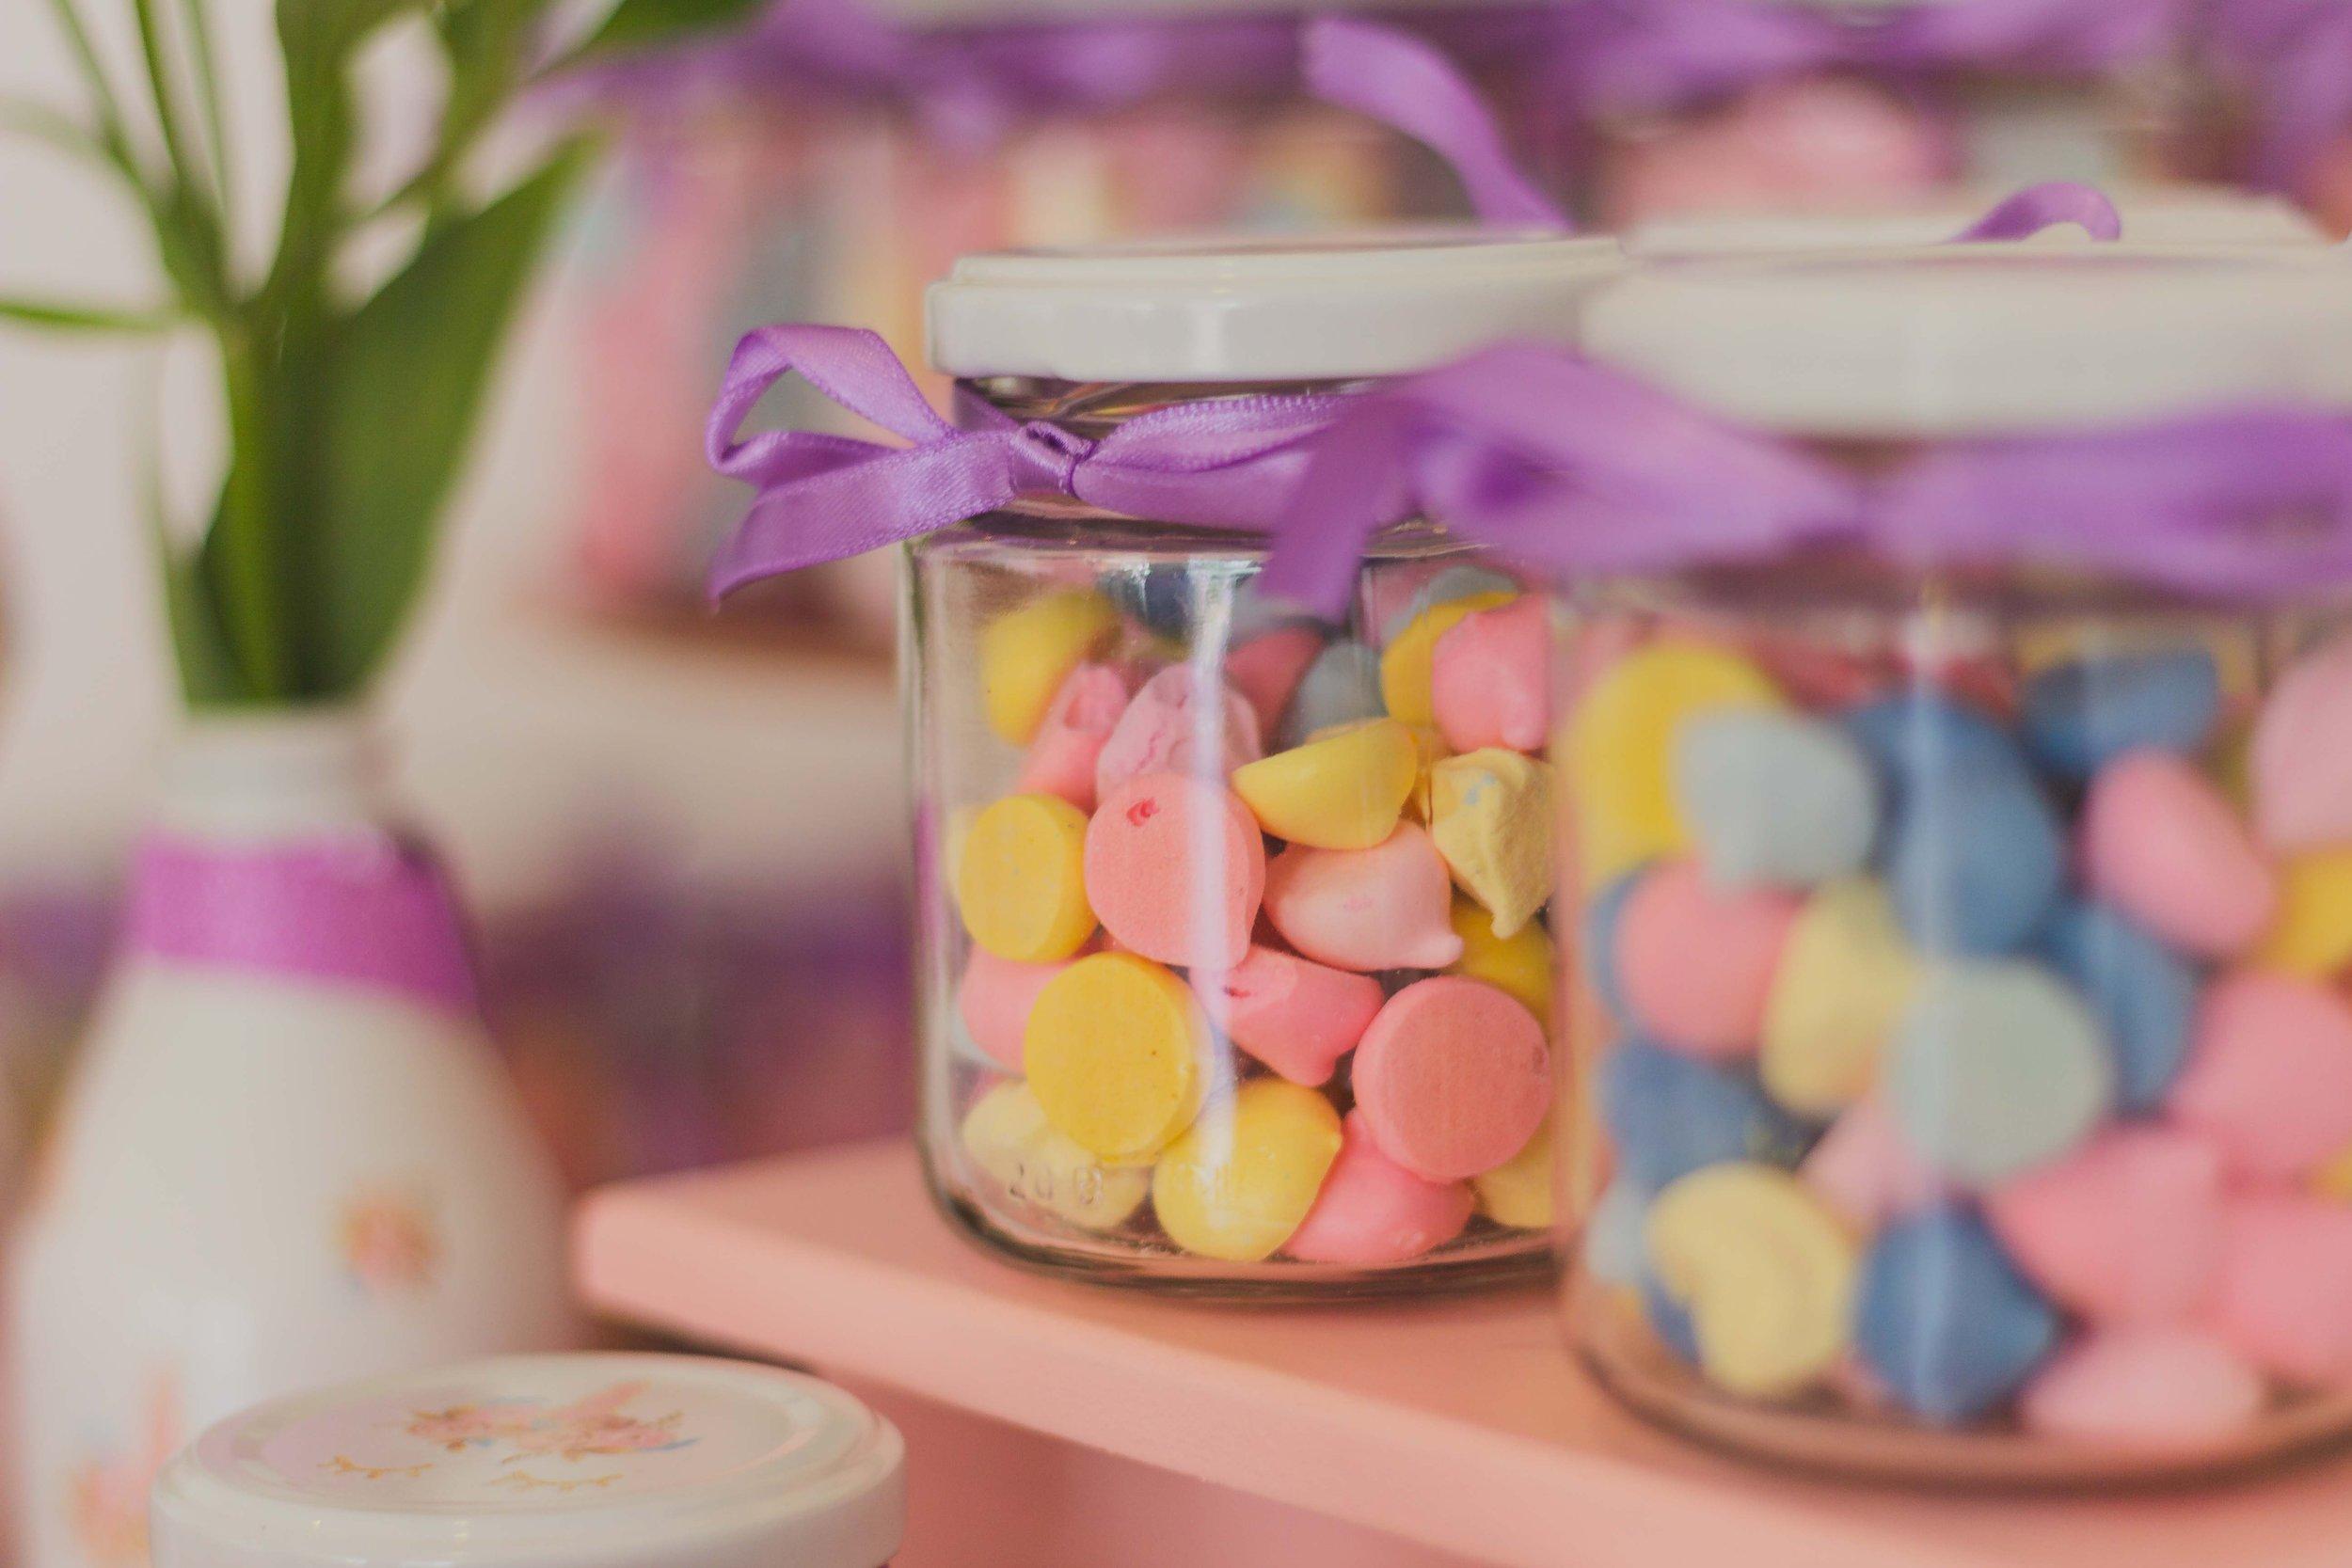 blurred-background-candies-close-up-1296170.jpg